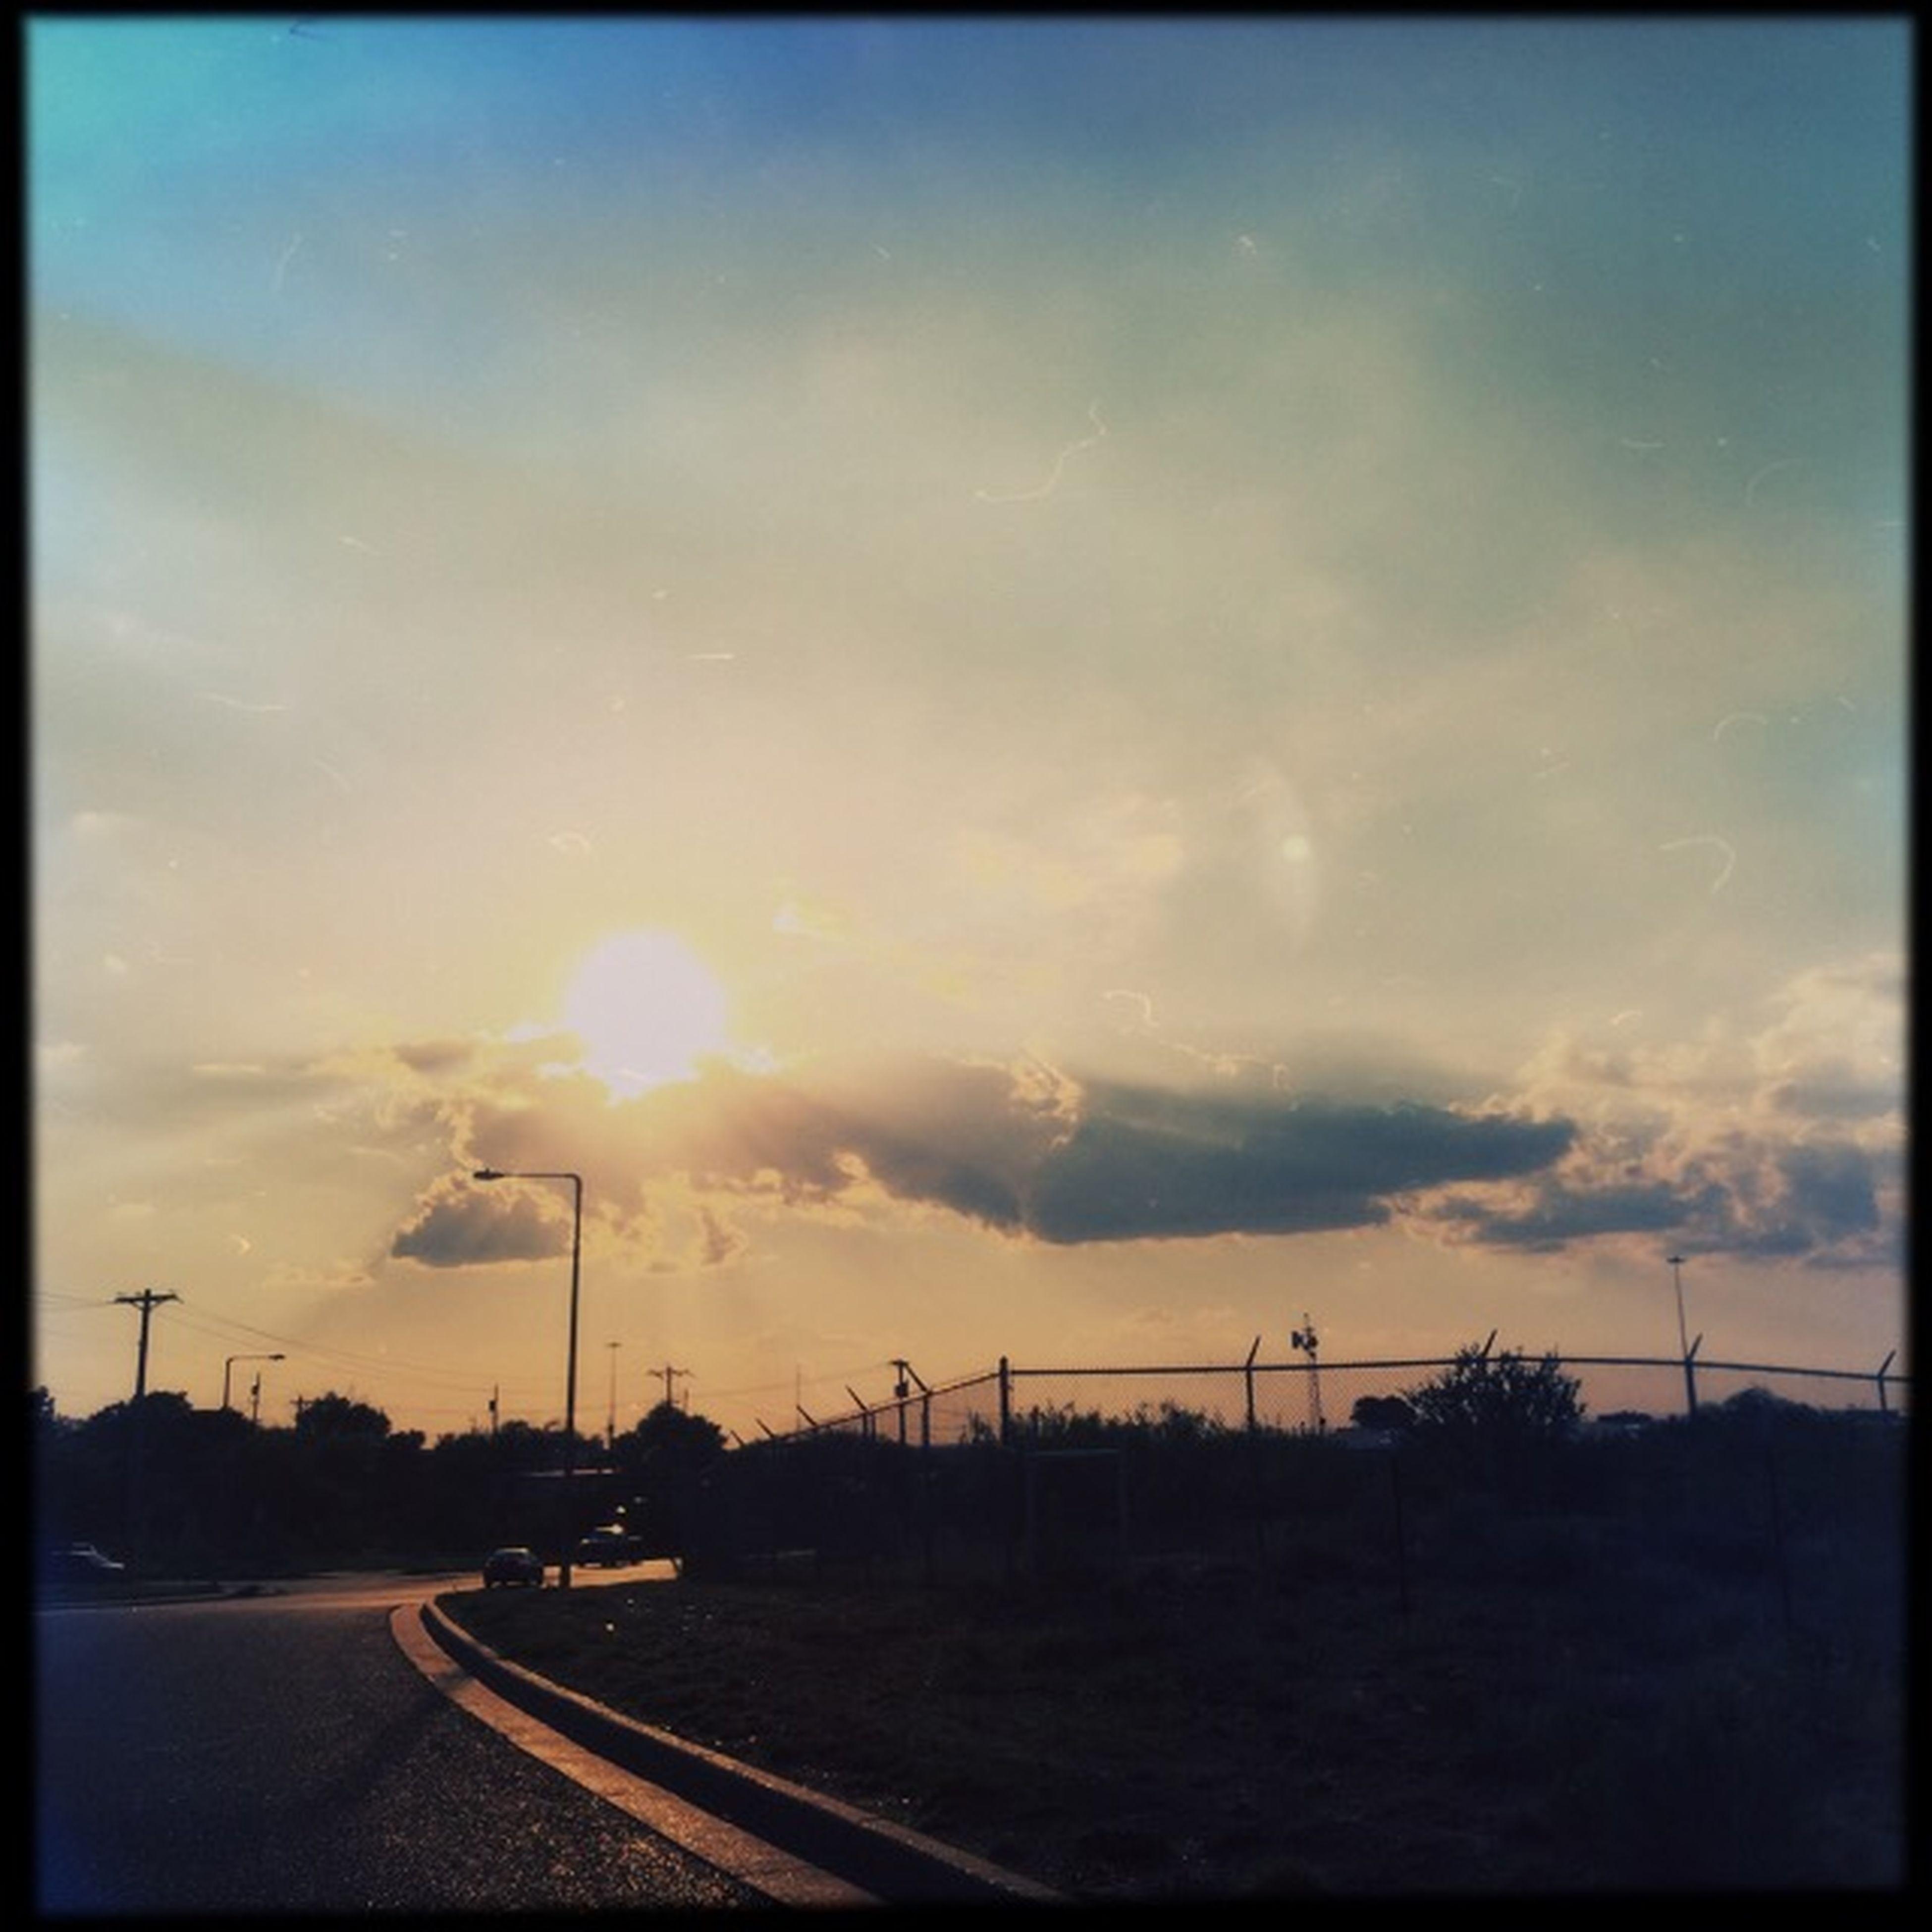 sunset, transportation, sky, transfer print, road, cloud - sky, landscape, auto post production filter, sun, car, orange color, field, cloud, scenics, mode of transport, nature, cloudy, land vehicle, beauty in nature, sunlight